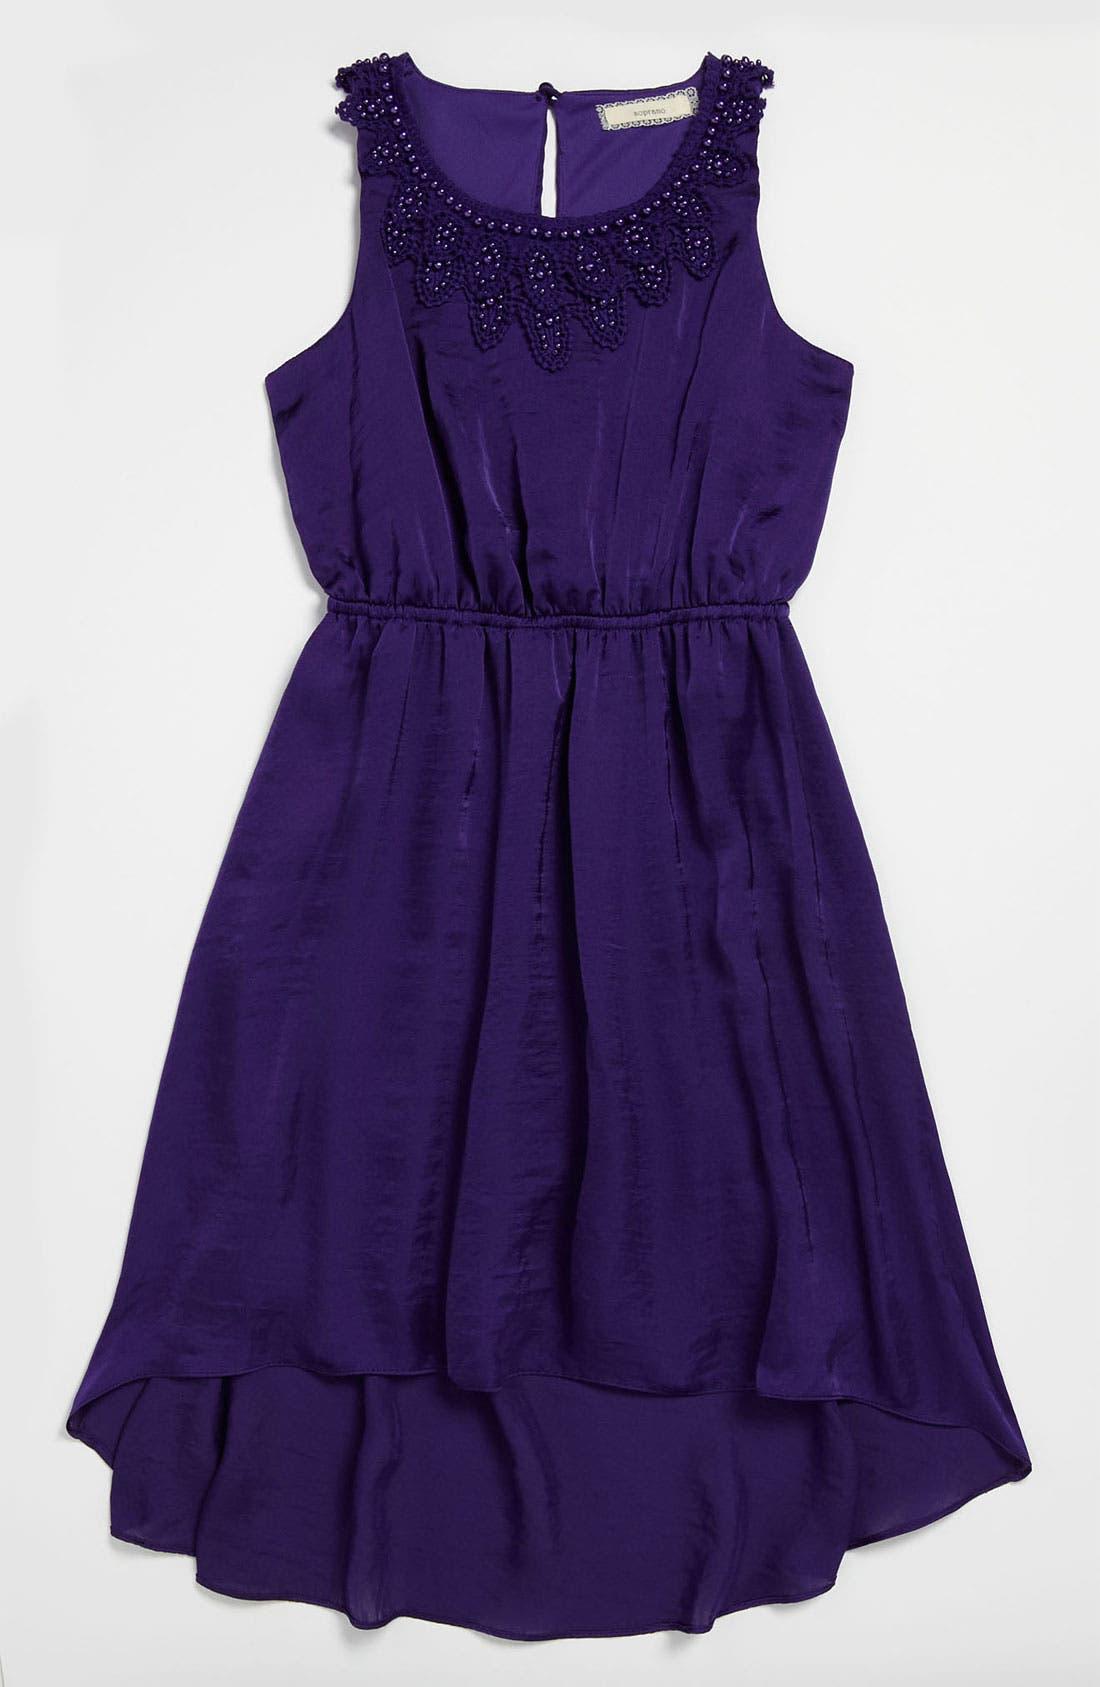 Alternate Image 1 Selected - Soprano Sleeveless Dress (Big Girls)